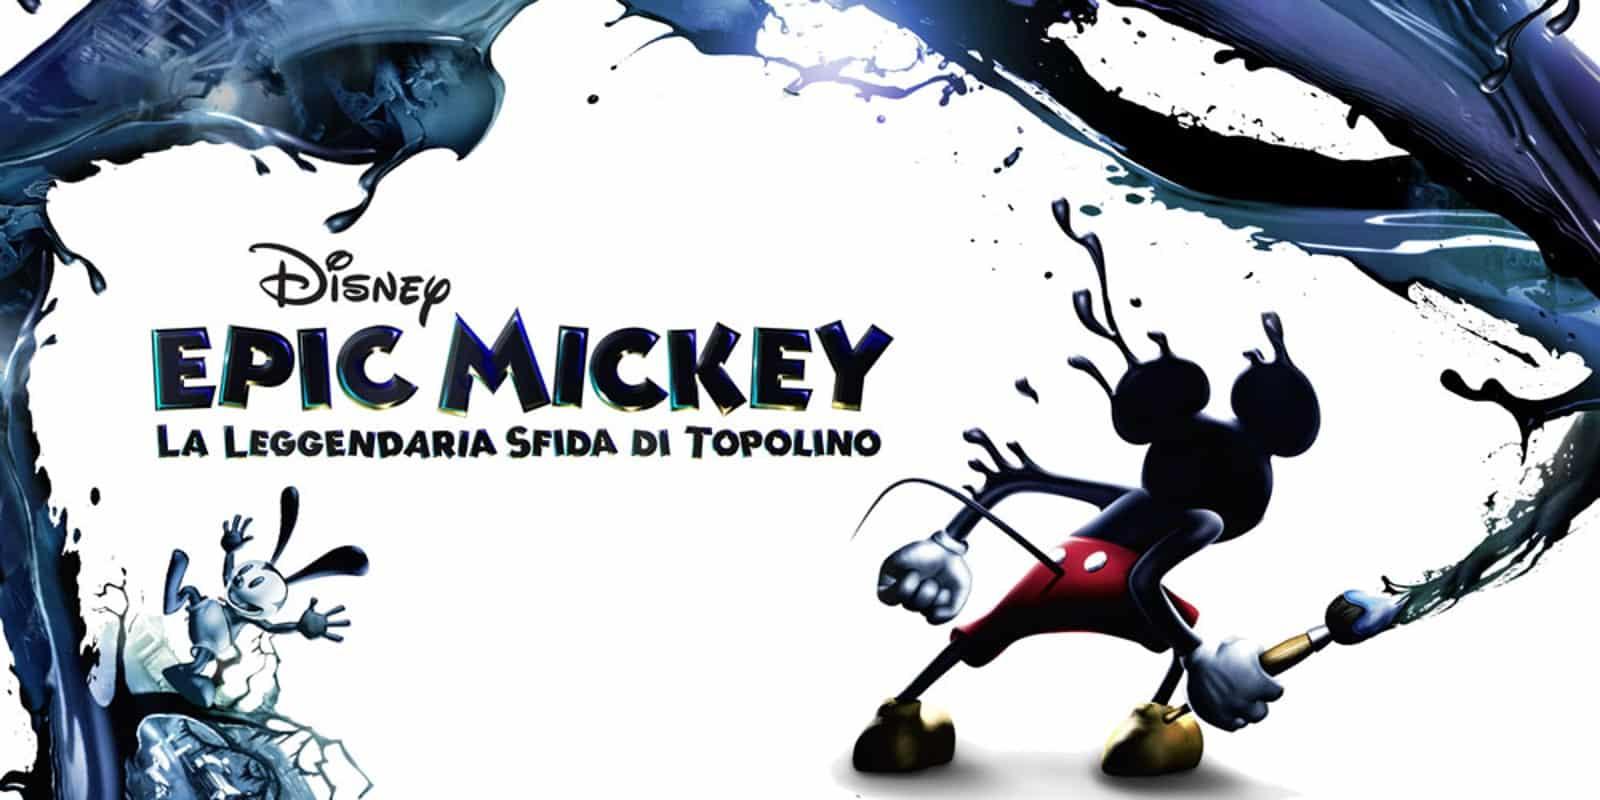 Epic Mickey Photo credit: web